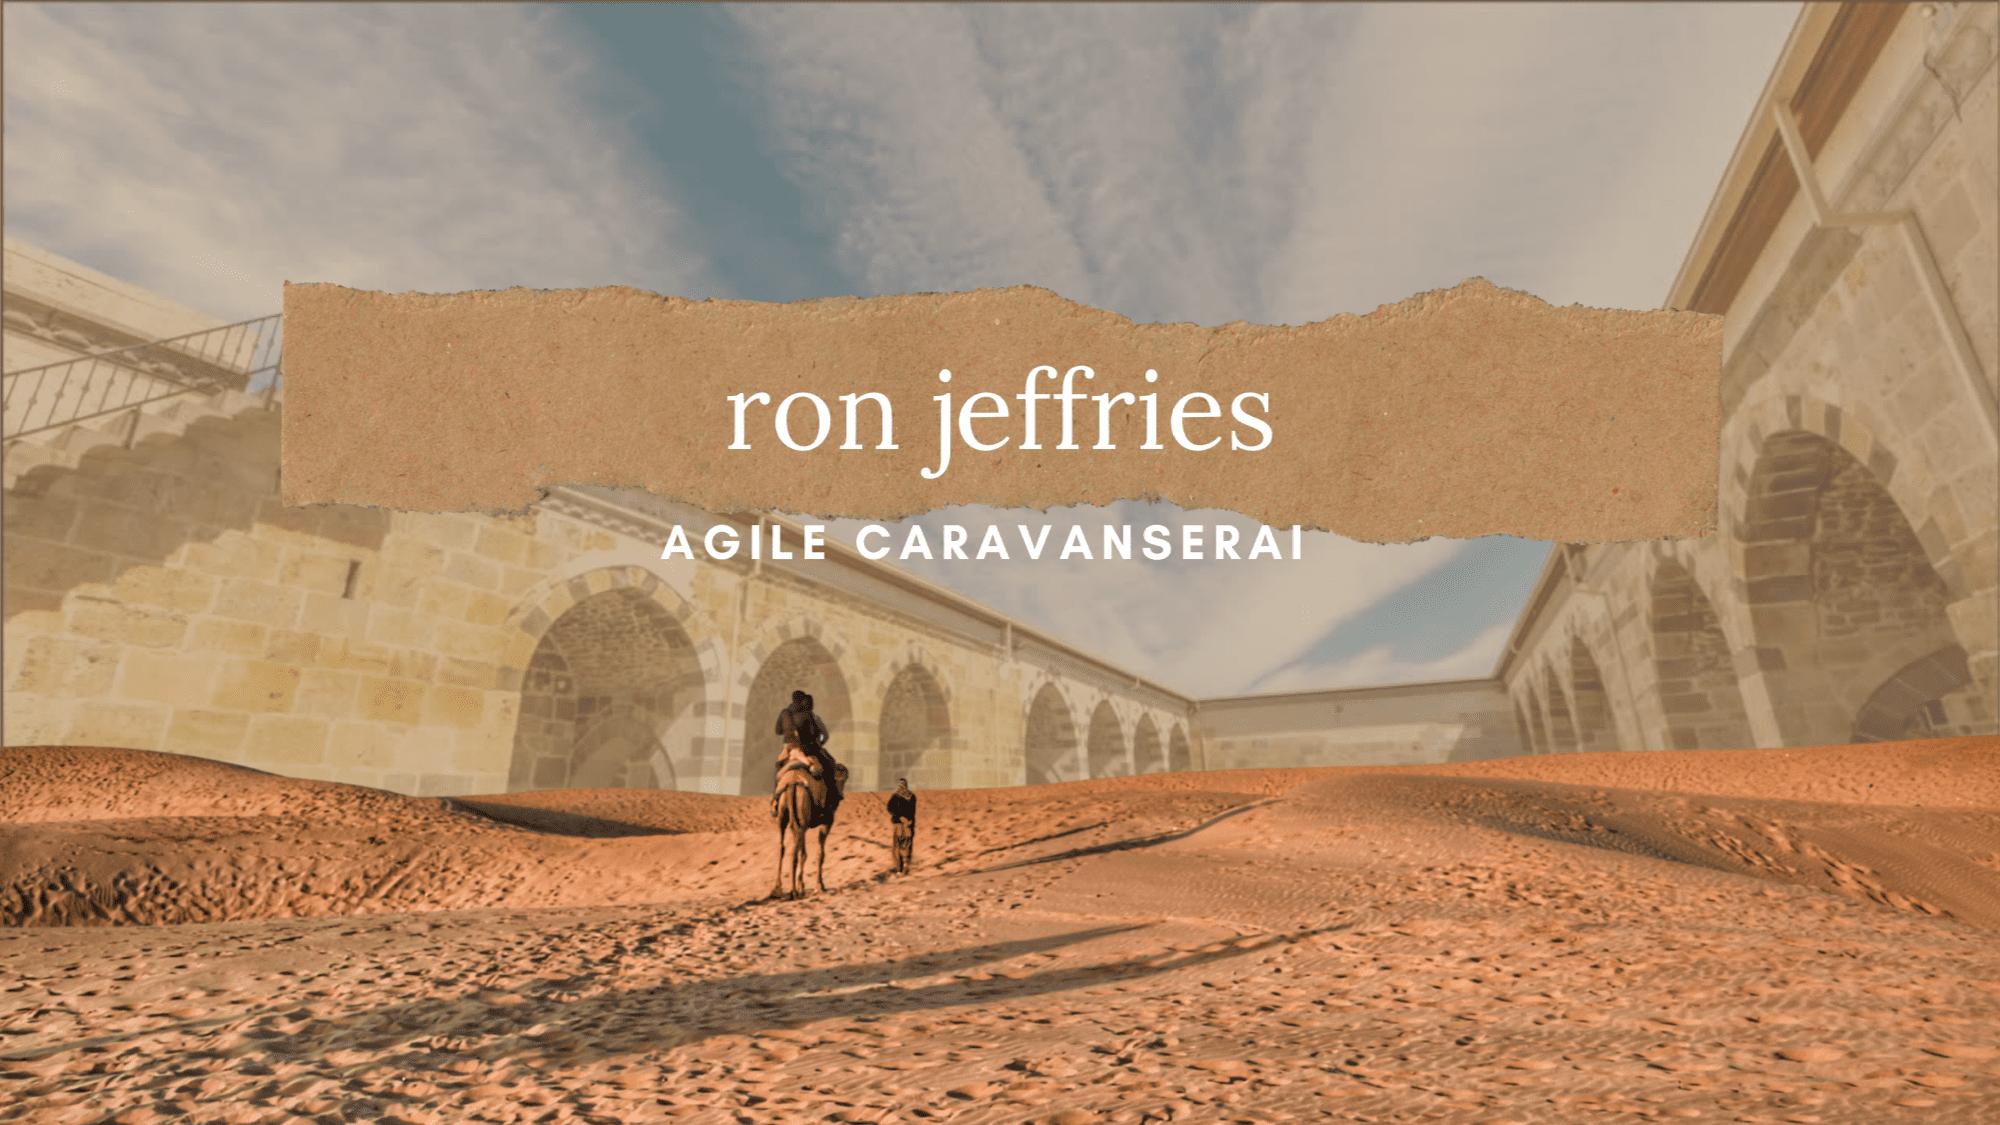 Agile Caravanserai Ron Jeffries